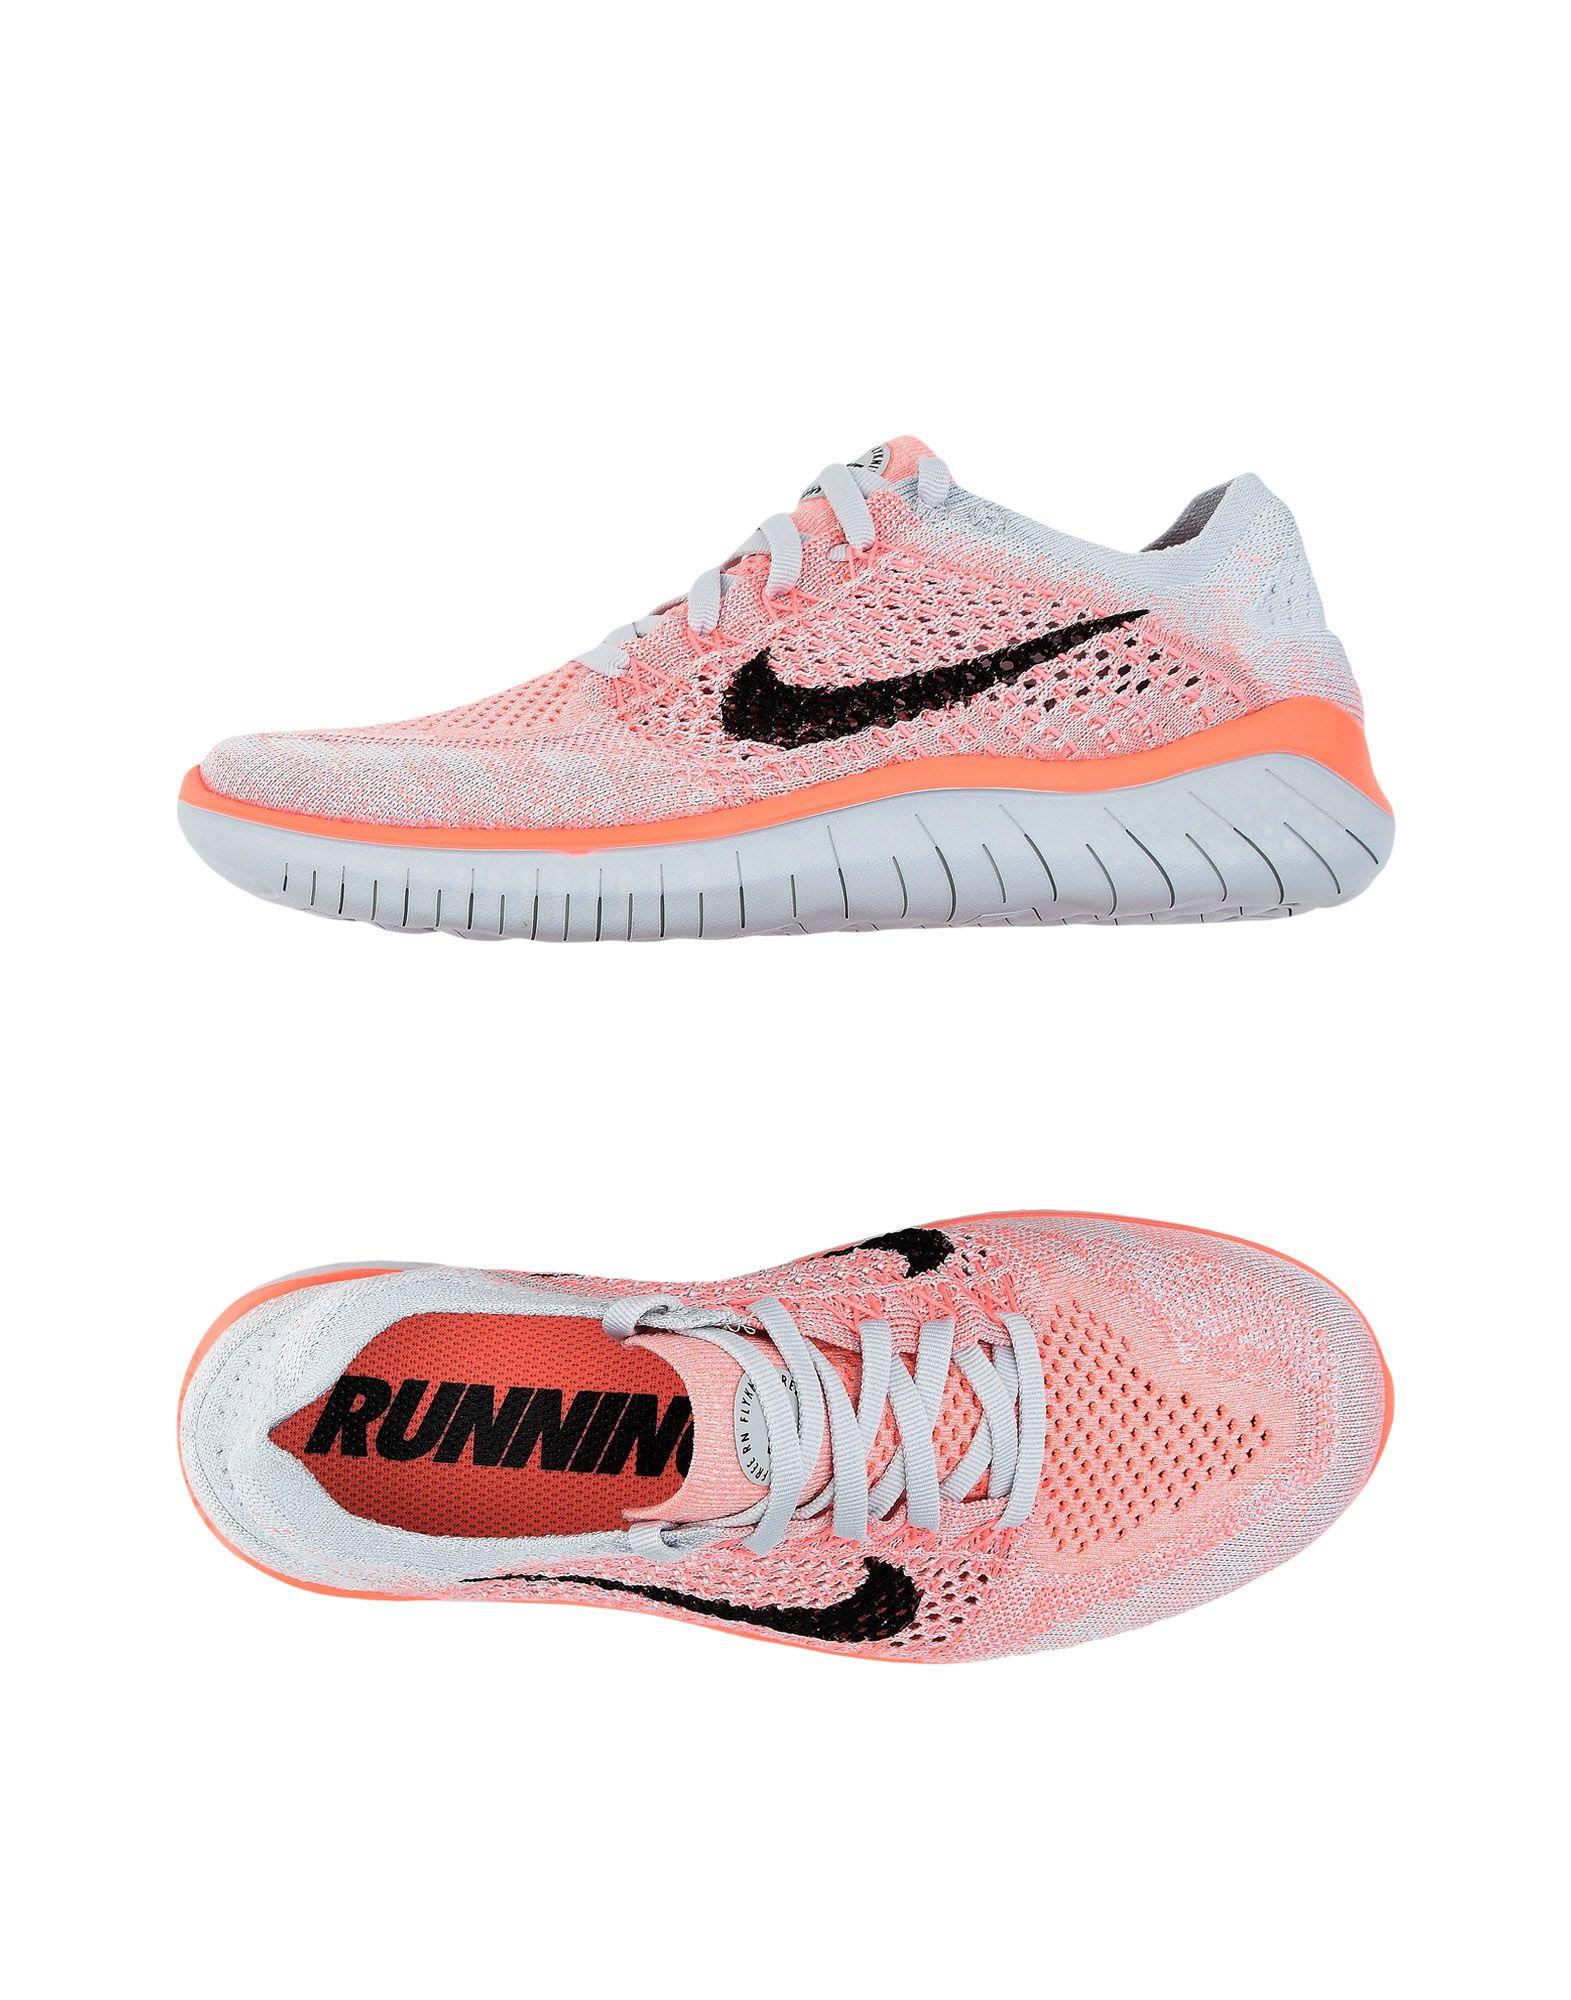 0d2f32a7565 Nike Wmns Nike Free Rn Flyknit 2018 - Sneakers - - - Women Nike Sneakers  online on United Kingdom - 11474937NA 10a882